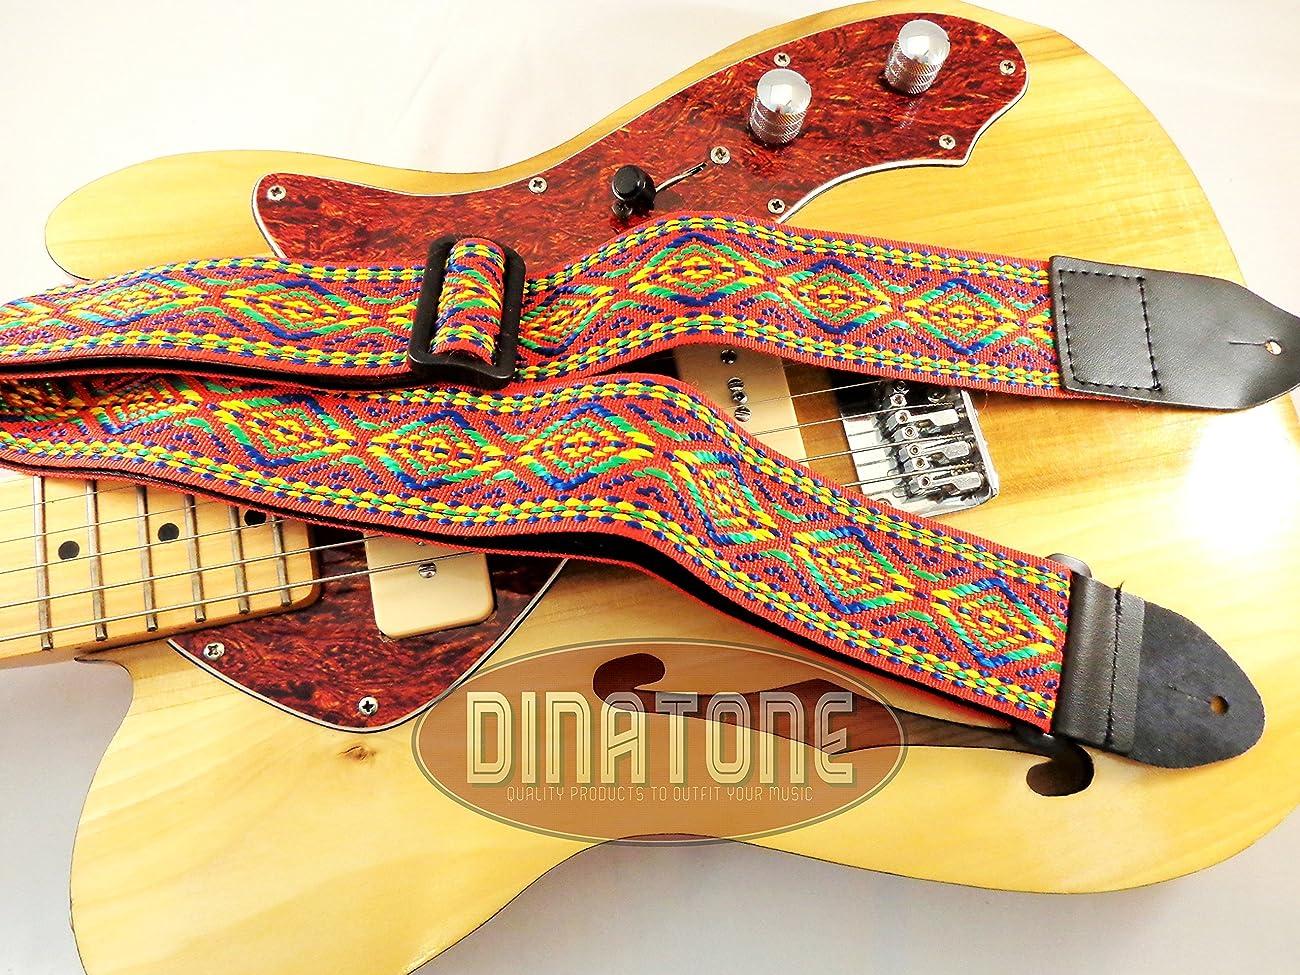 Red Retro Vintage Hippie Acoustic Electric Guitar Strap Faux Leather Ends 60's 2